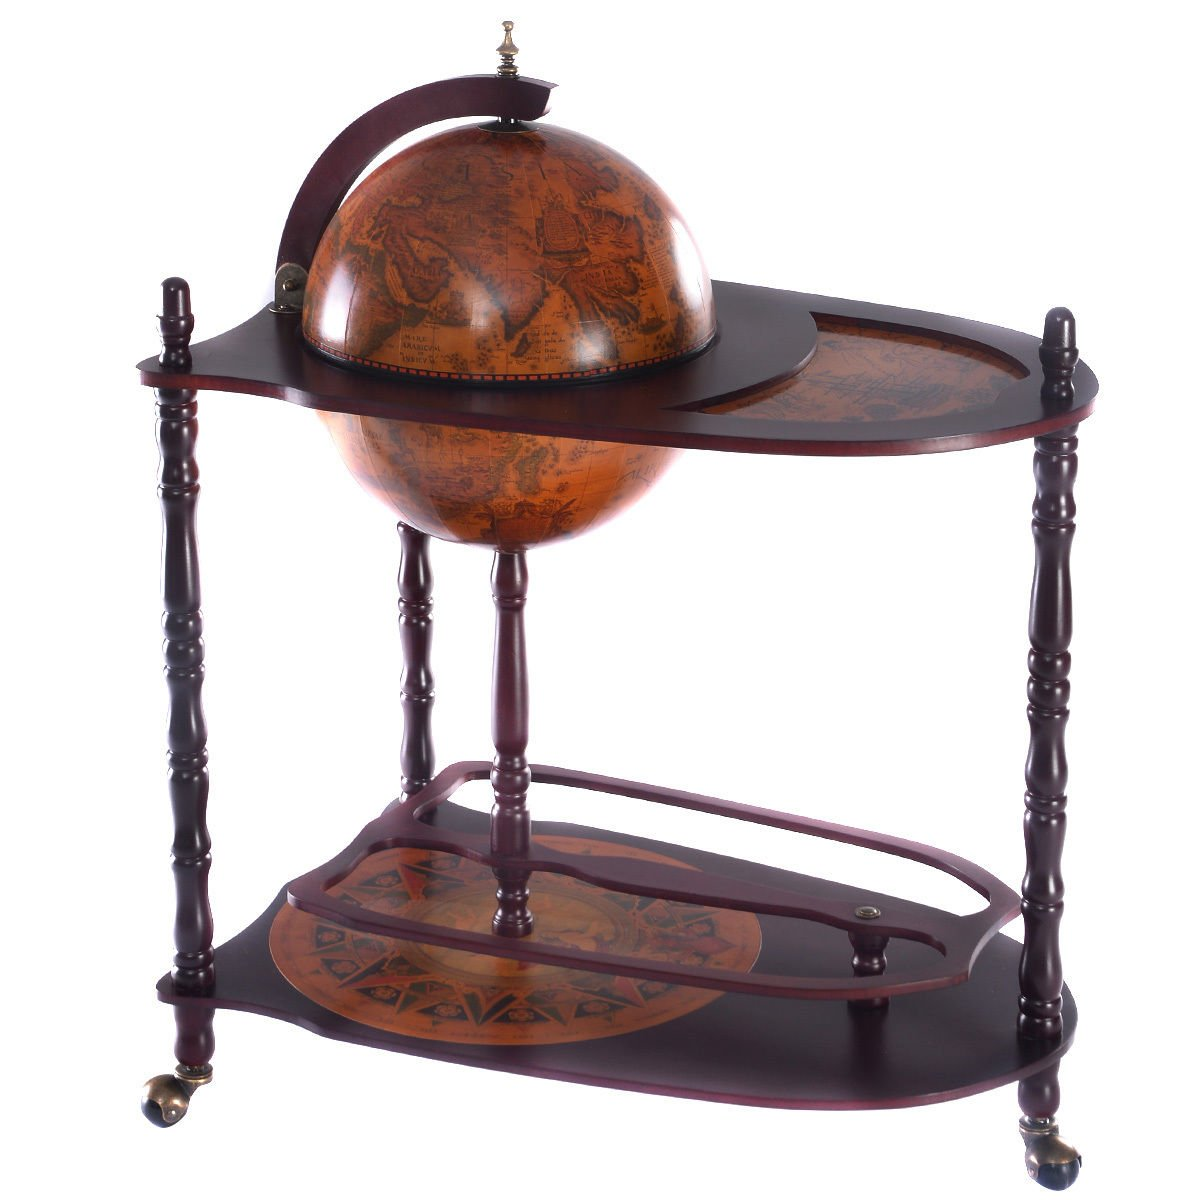 34'' Globe Wine Bar Stand H 16th Century Italian Rack Liquor Bottle Shelf Wood by White Bear & Brown Rabbit